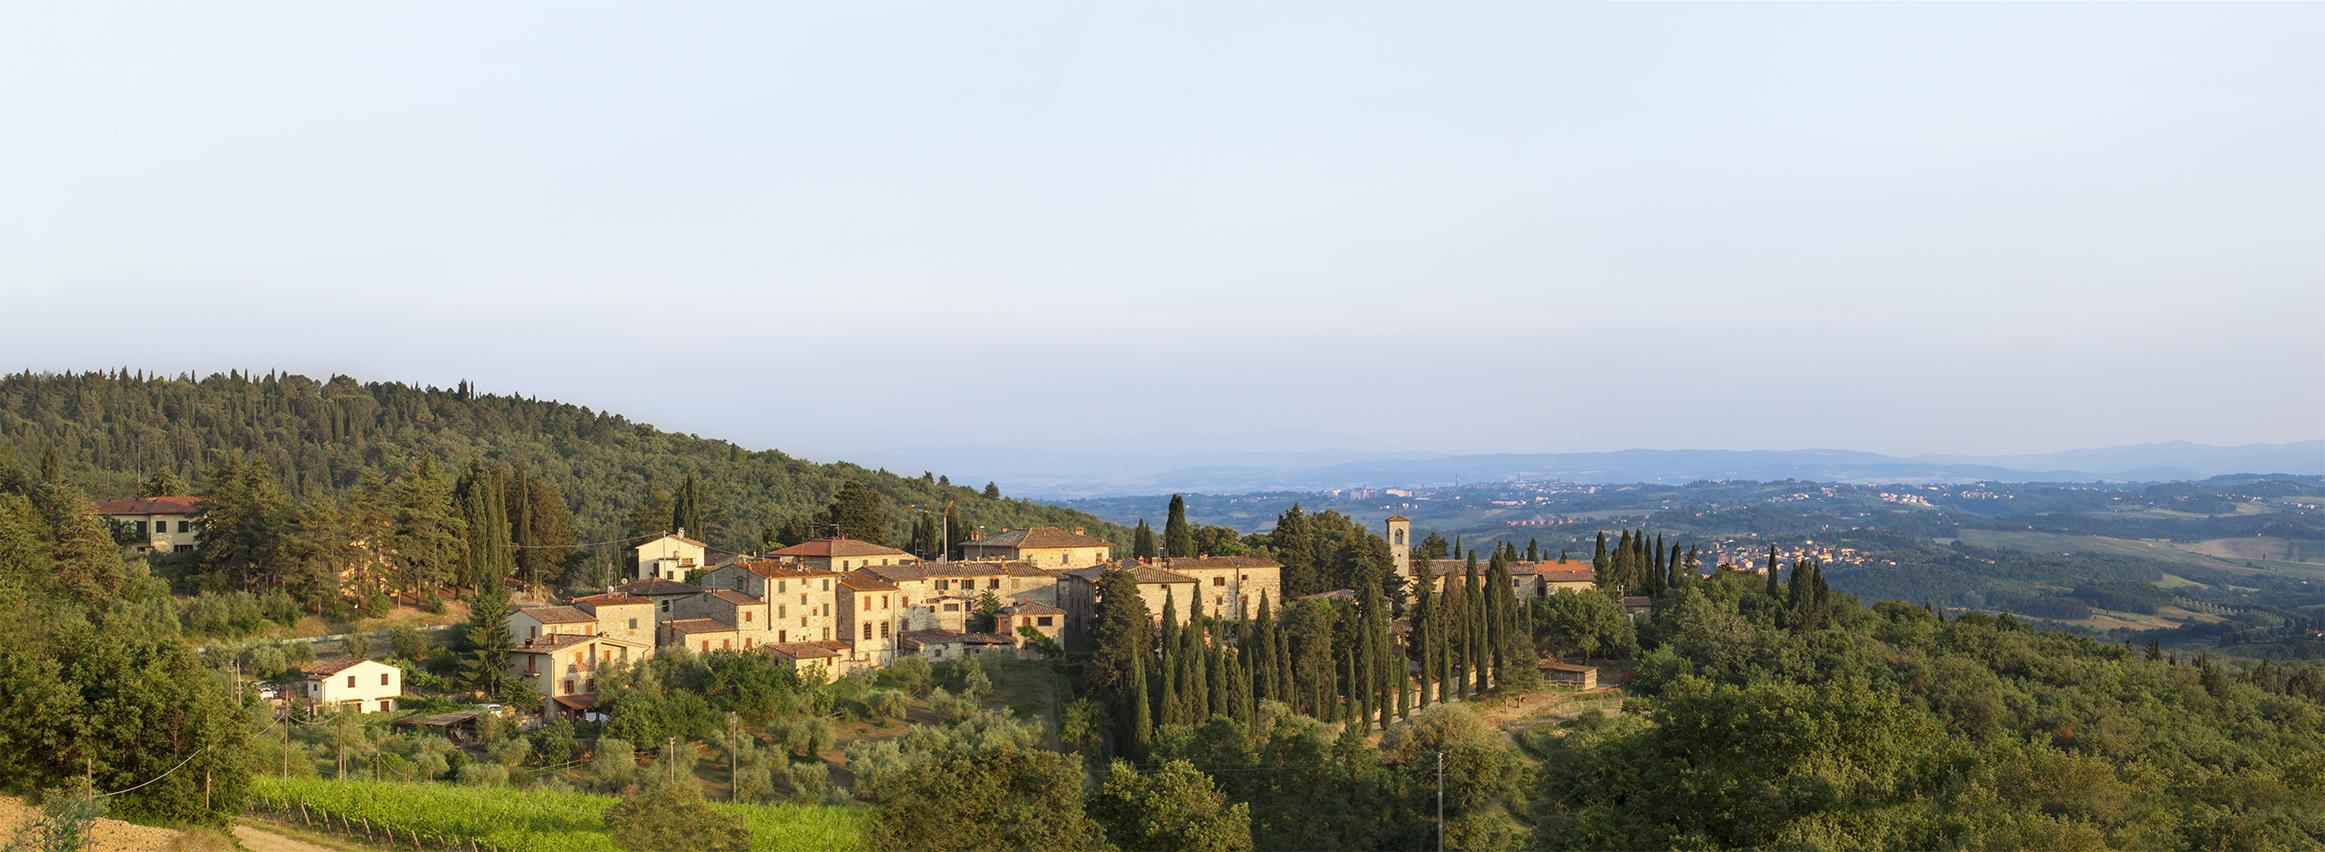 fonterutoli_paesaggi_daniela-marchi_321_panorama